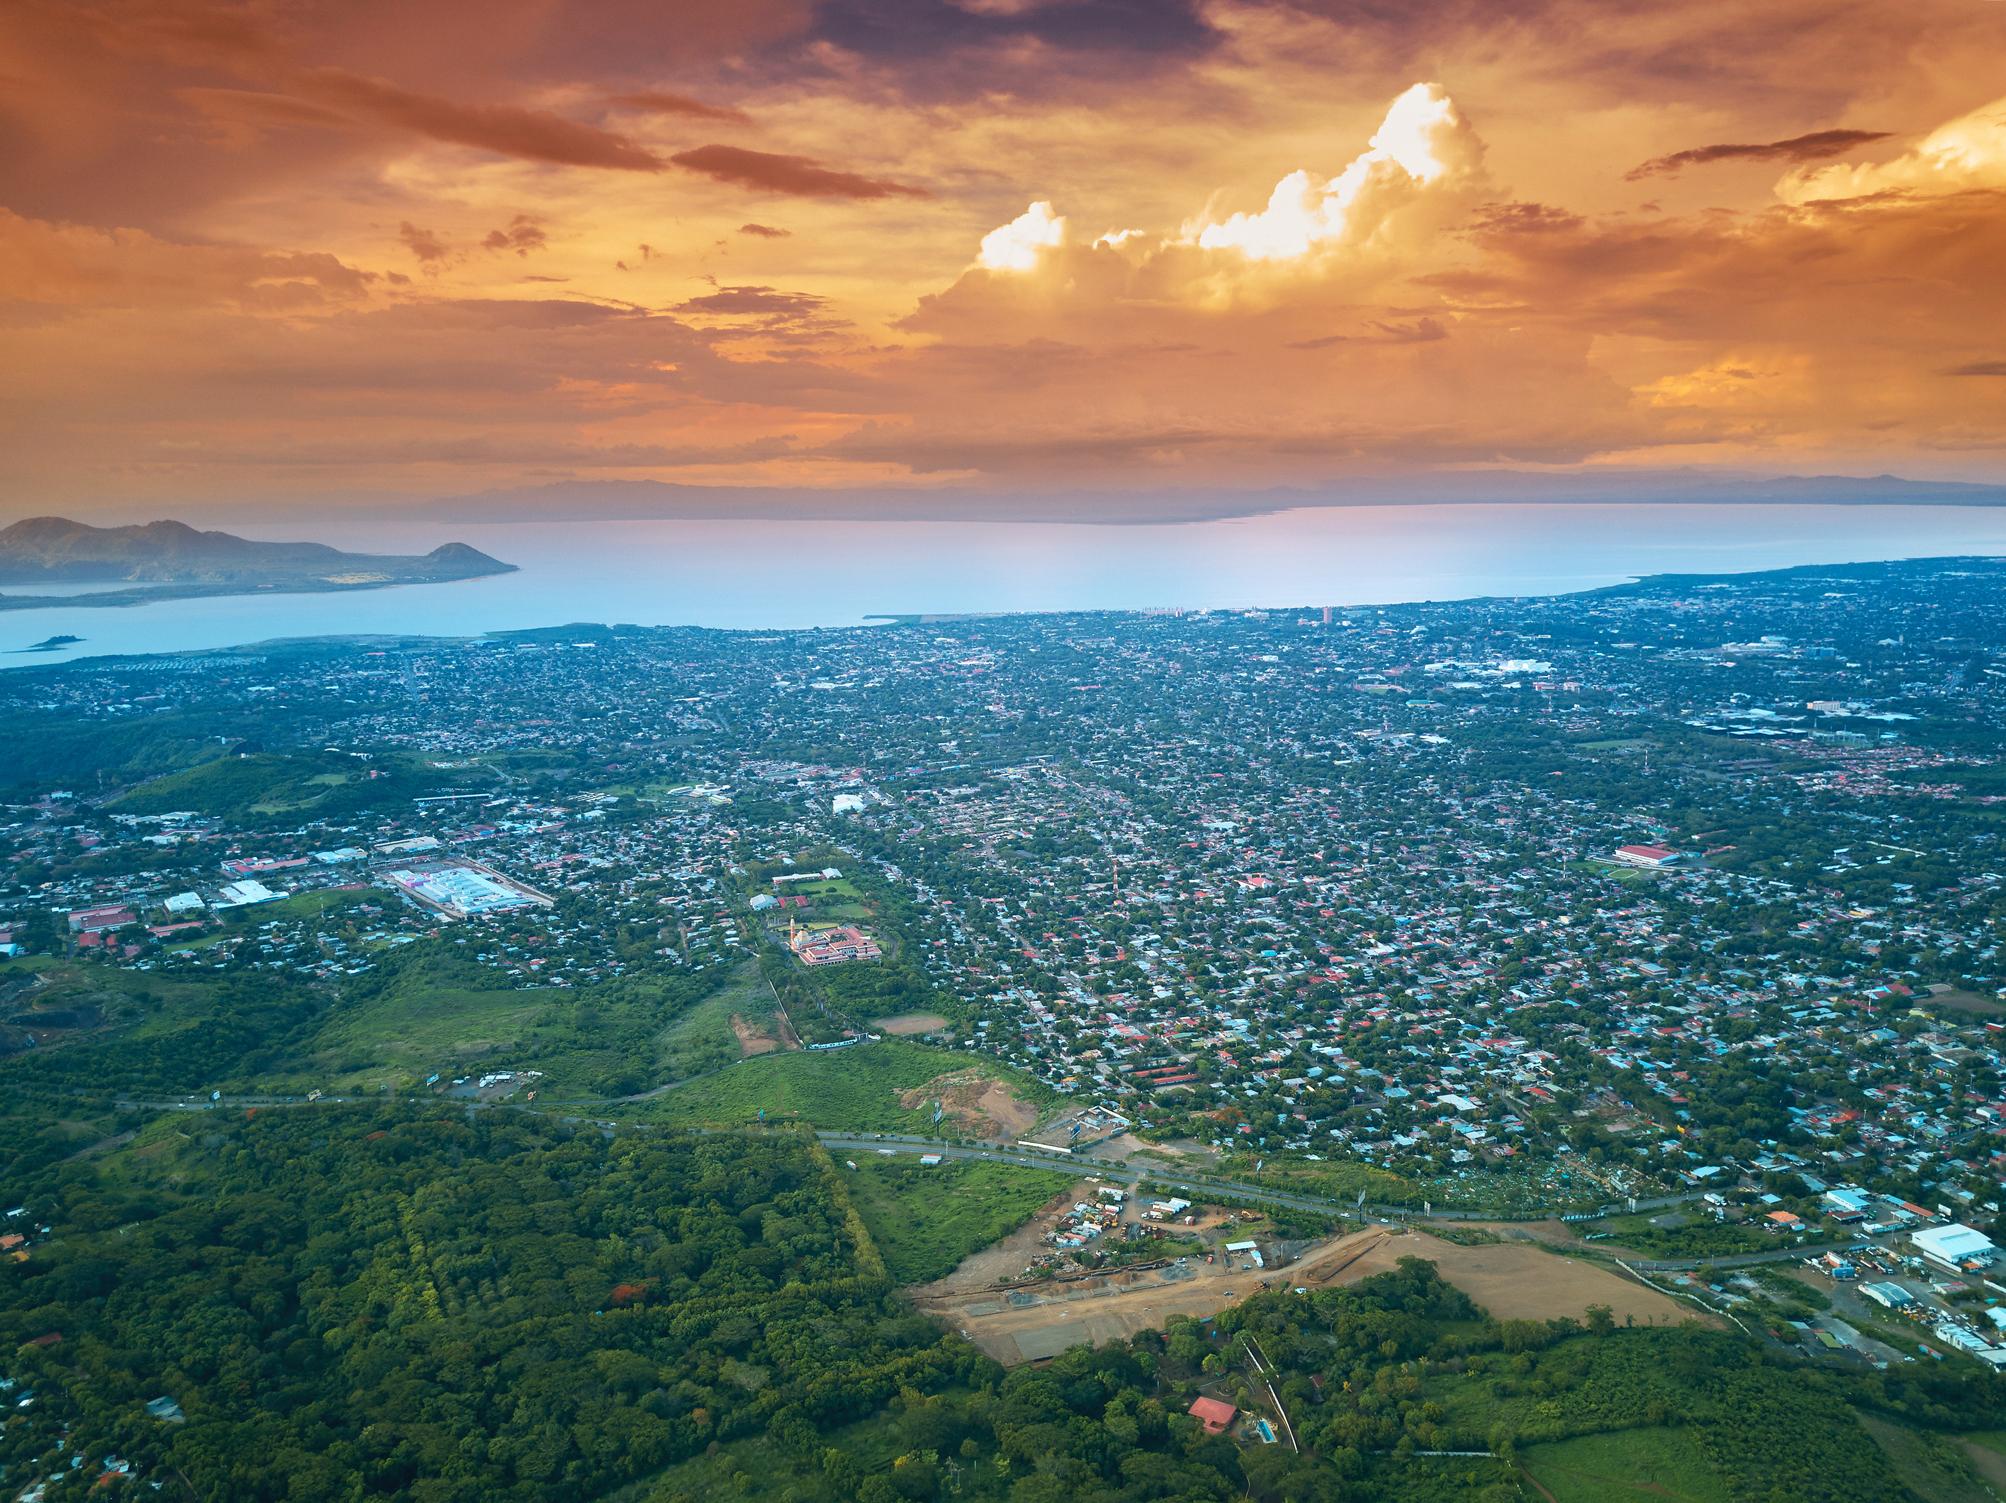 https://blancocigars.com/wp-content/uploads/2020/06/Managua-Nicaragua.jpg